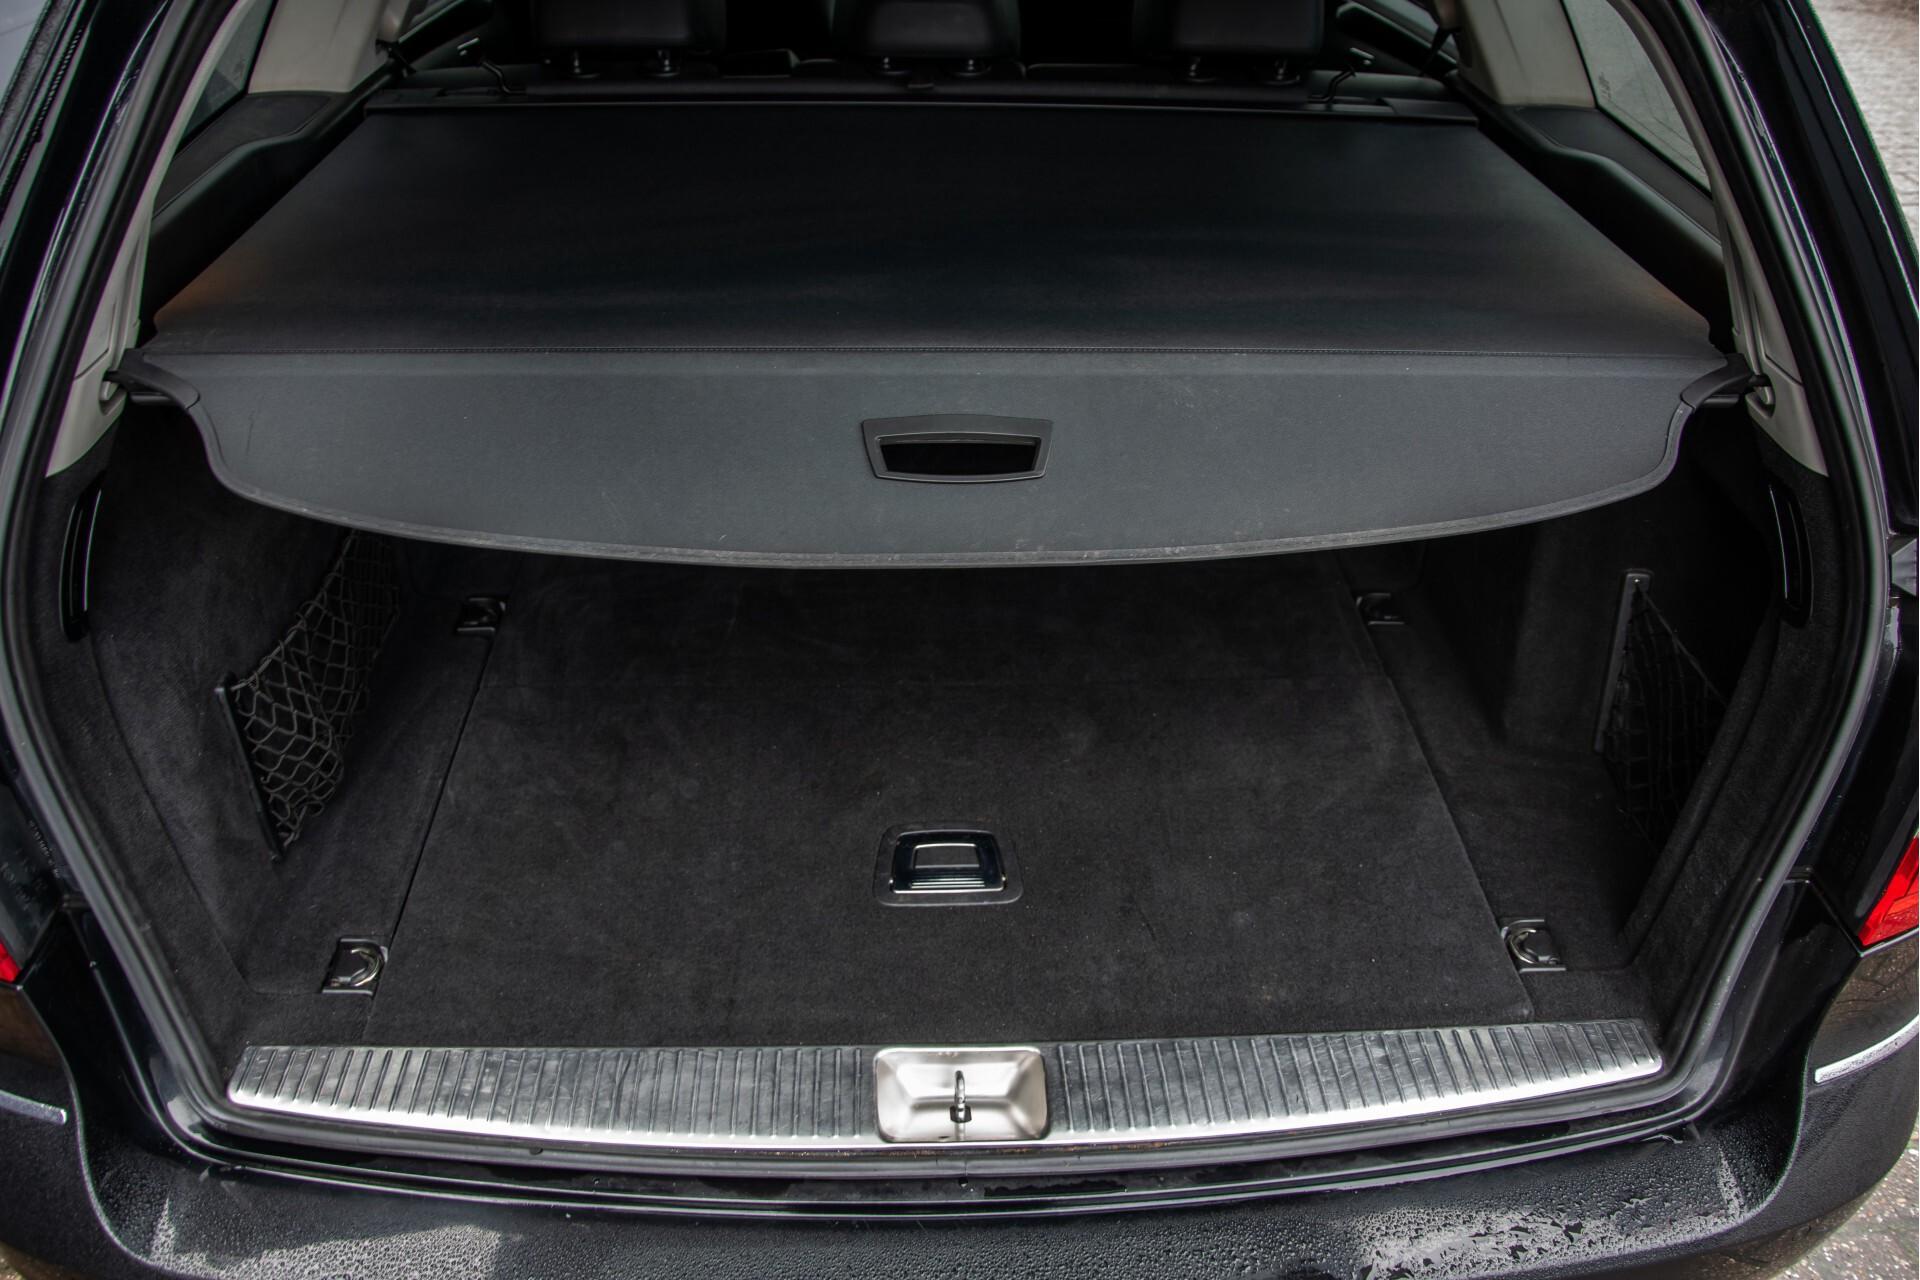 "Mercedes-Benz E-Klasse Estate 220 Cdi Avantgarde Wegklapbare trekhaak/18""/Privacyglas Aut7 Foto 35"